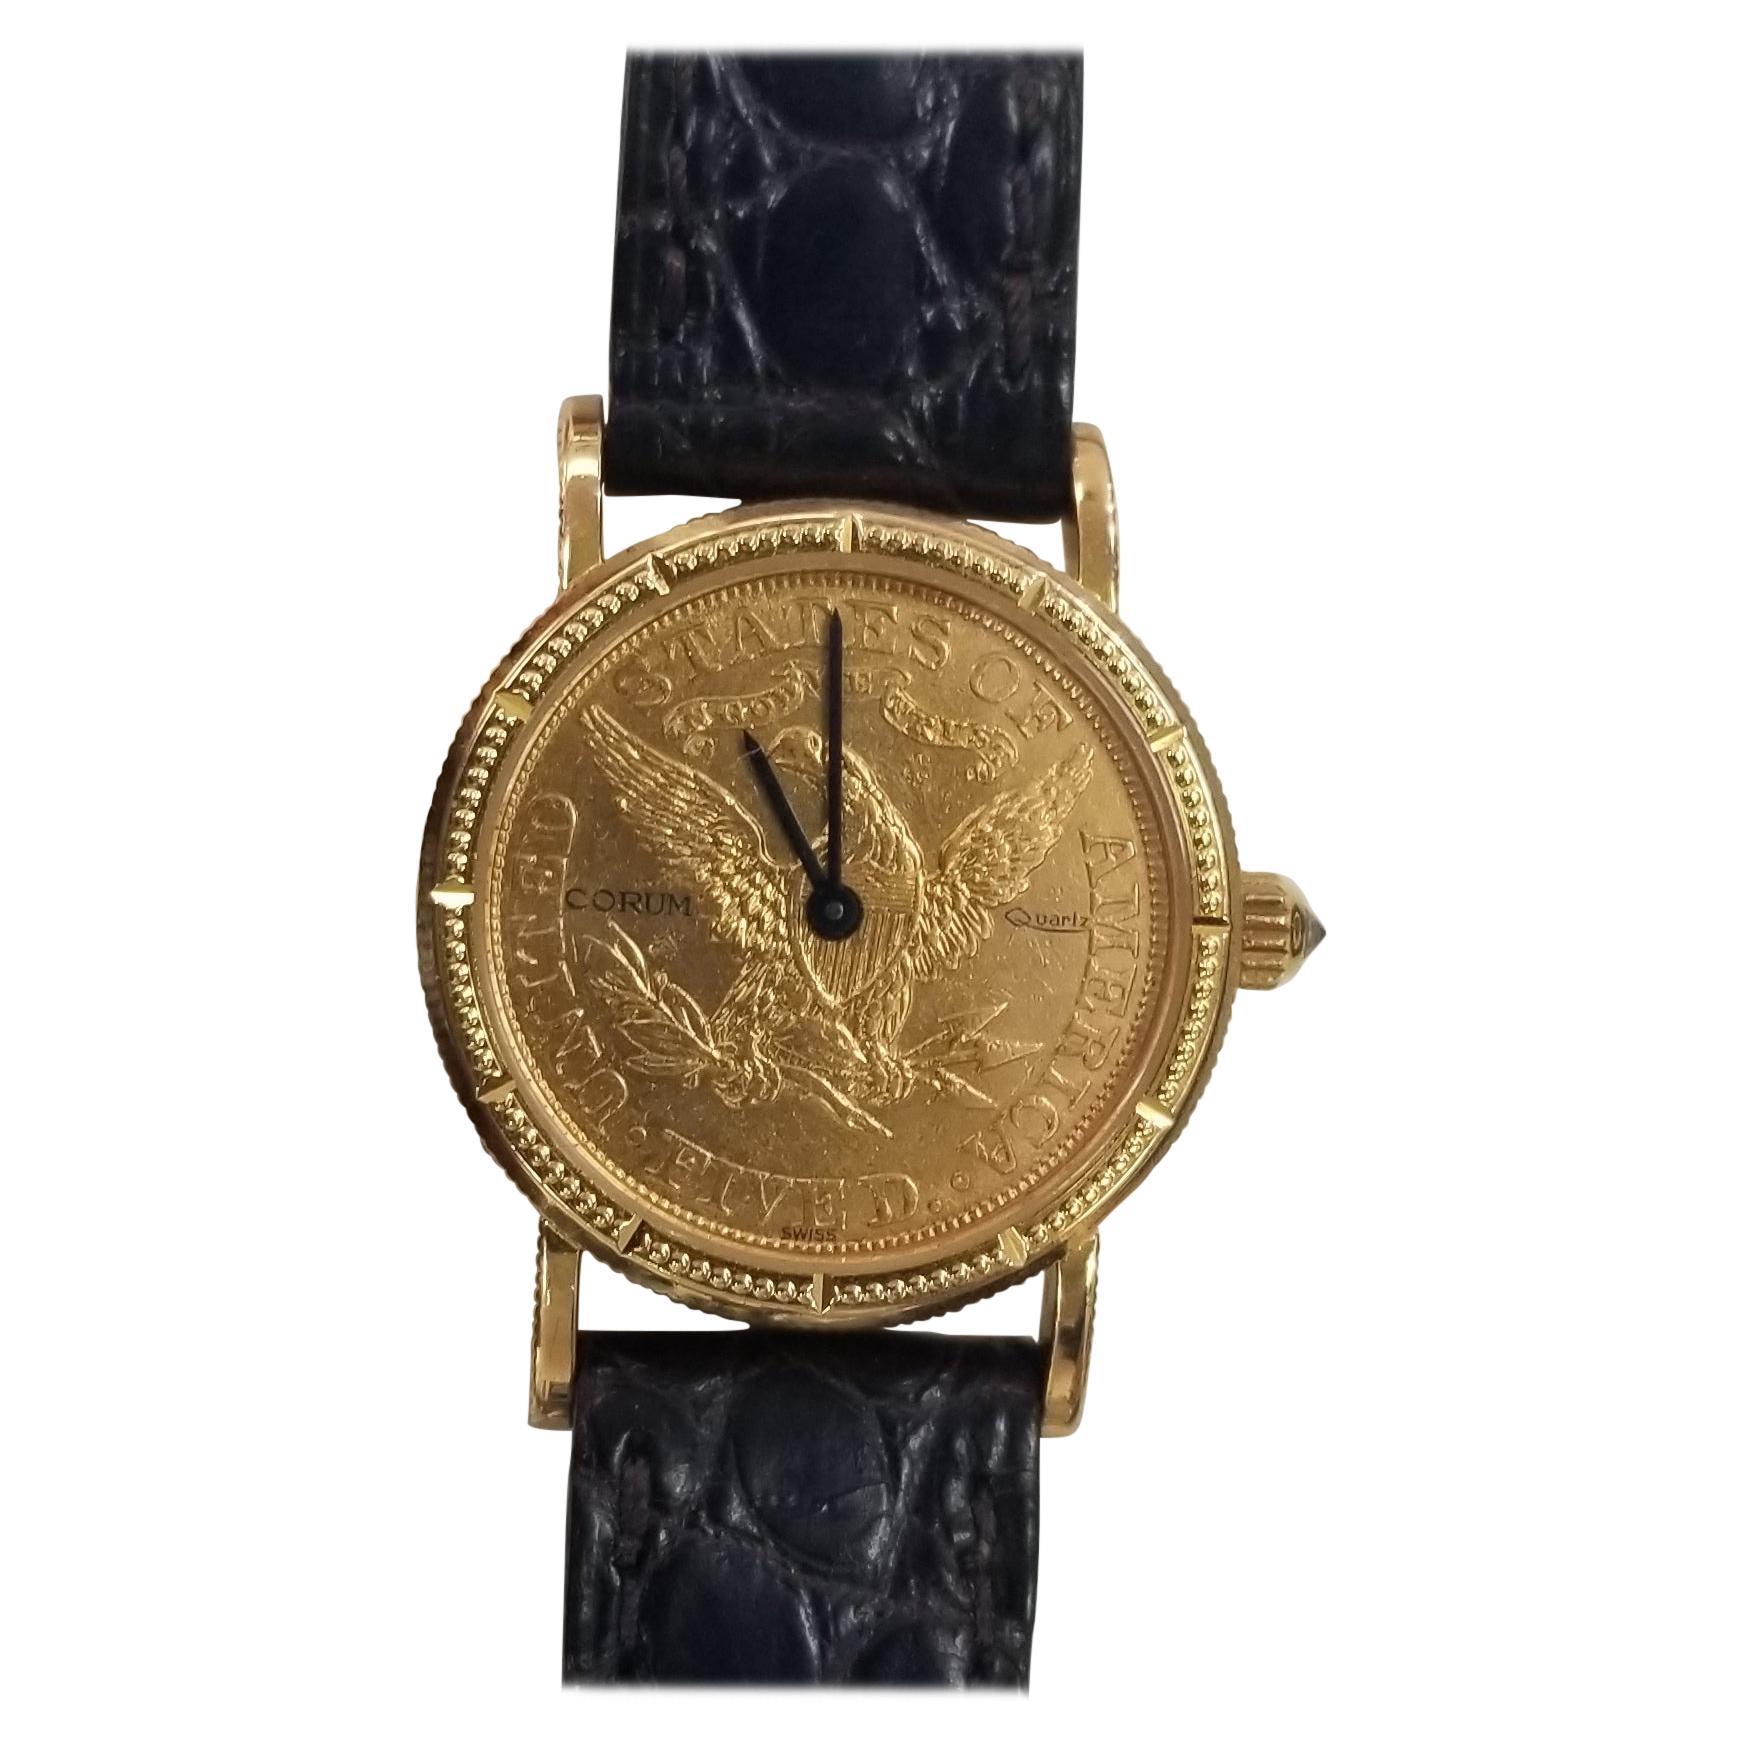 1898 $5 Gold Eagle-Liberty Corum Quartz Watch